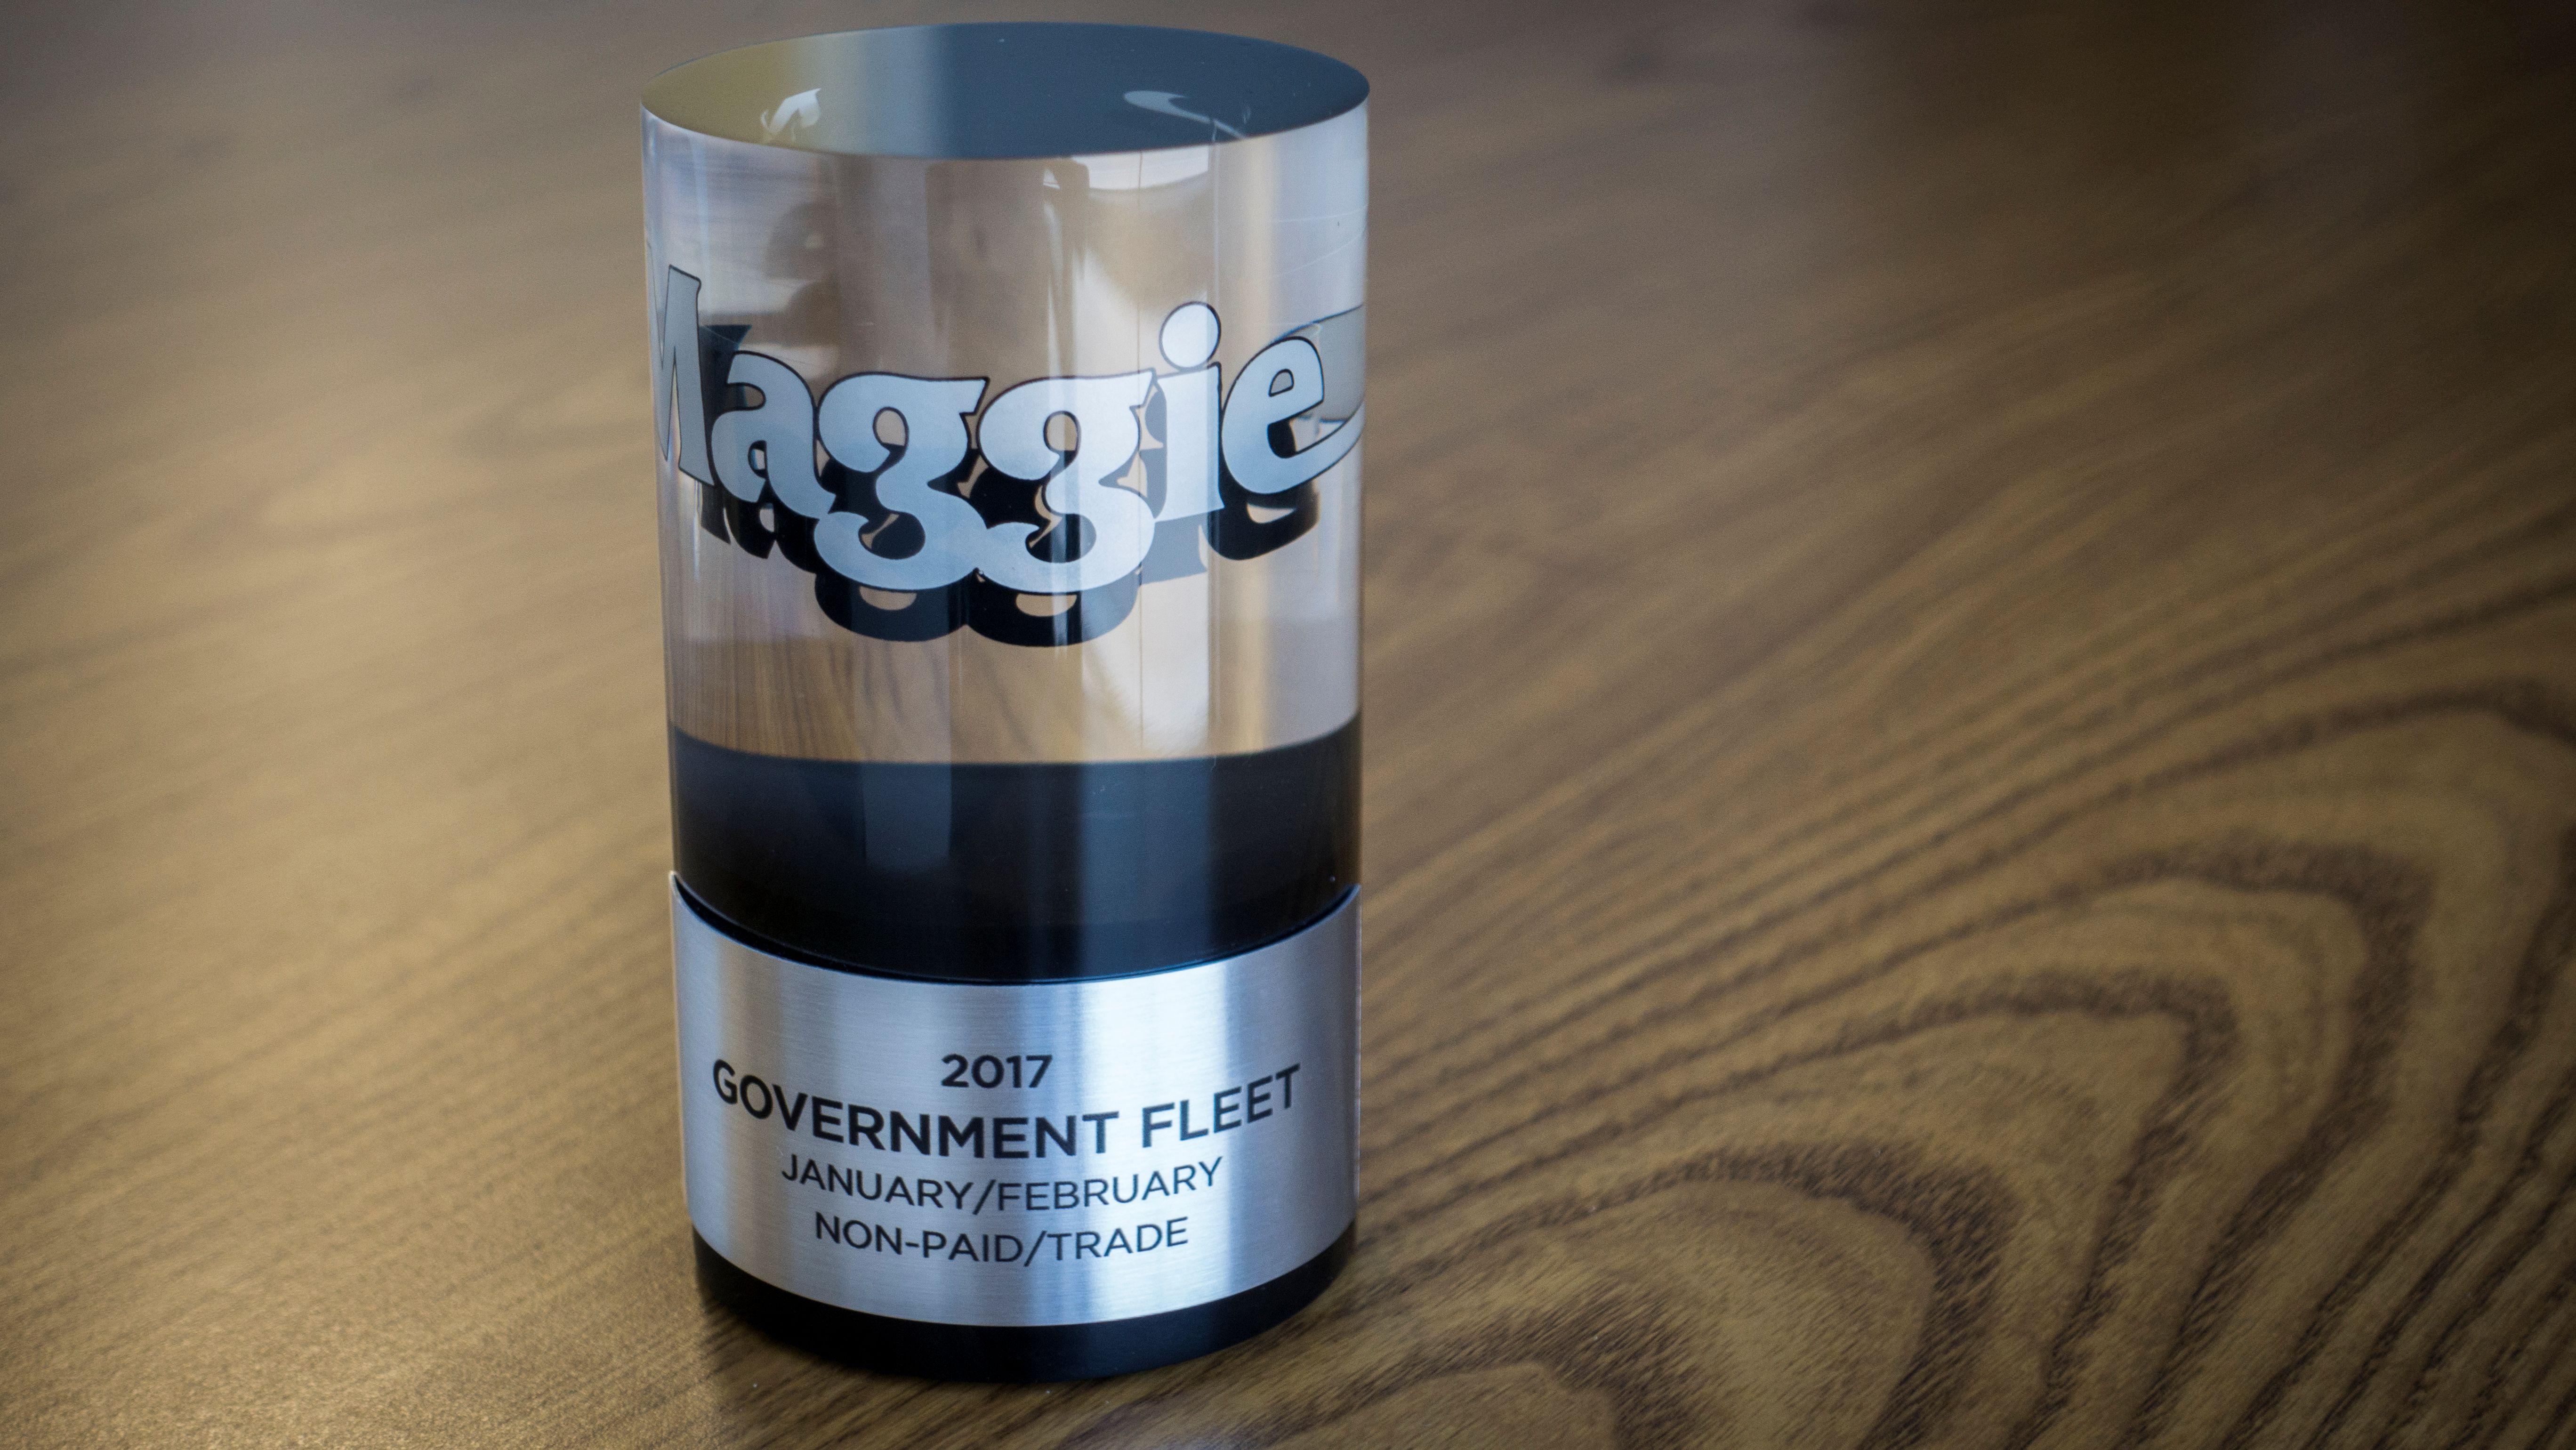 Government Fleet Wins Publishing Award